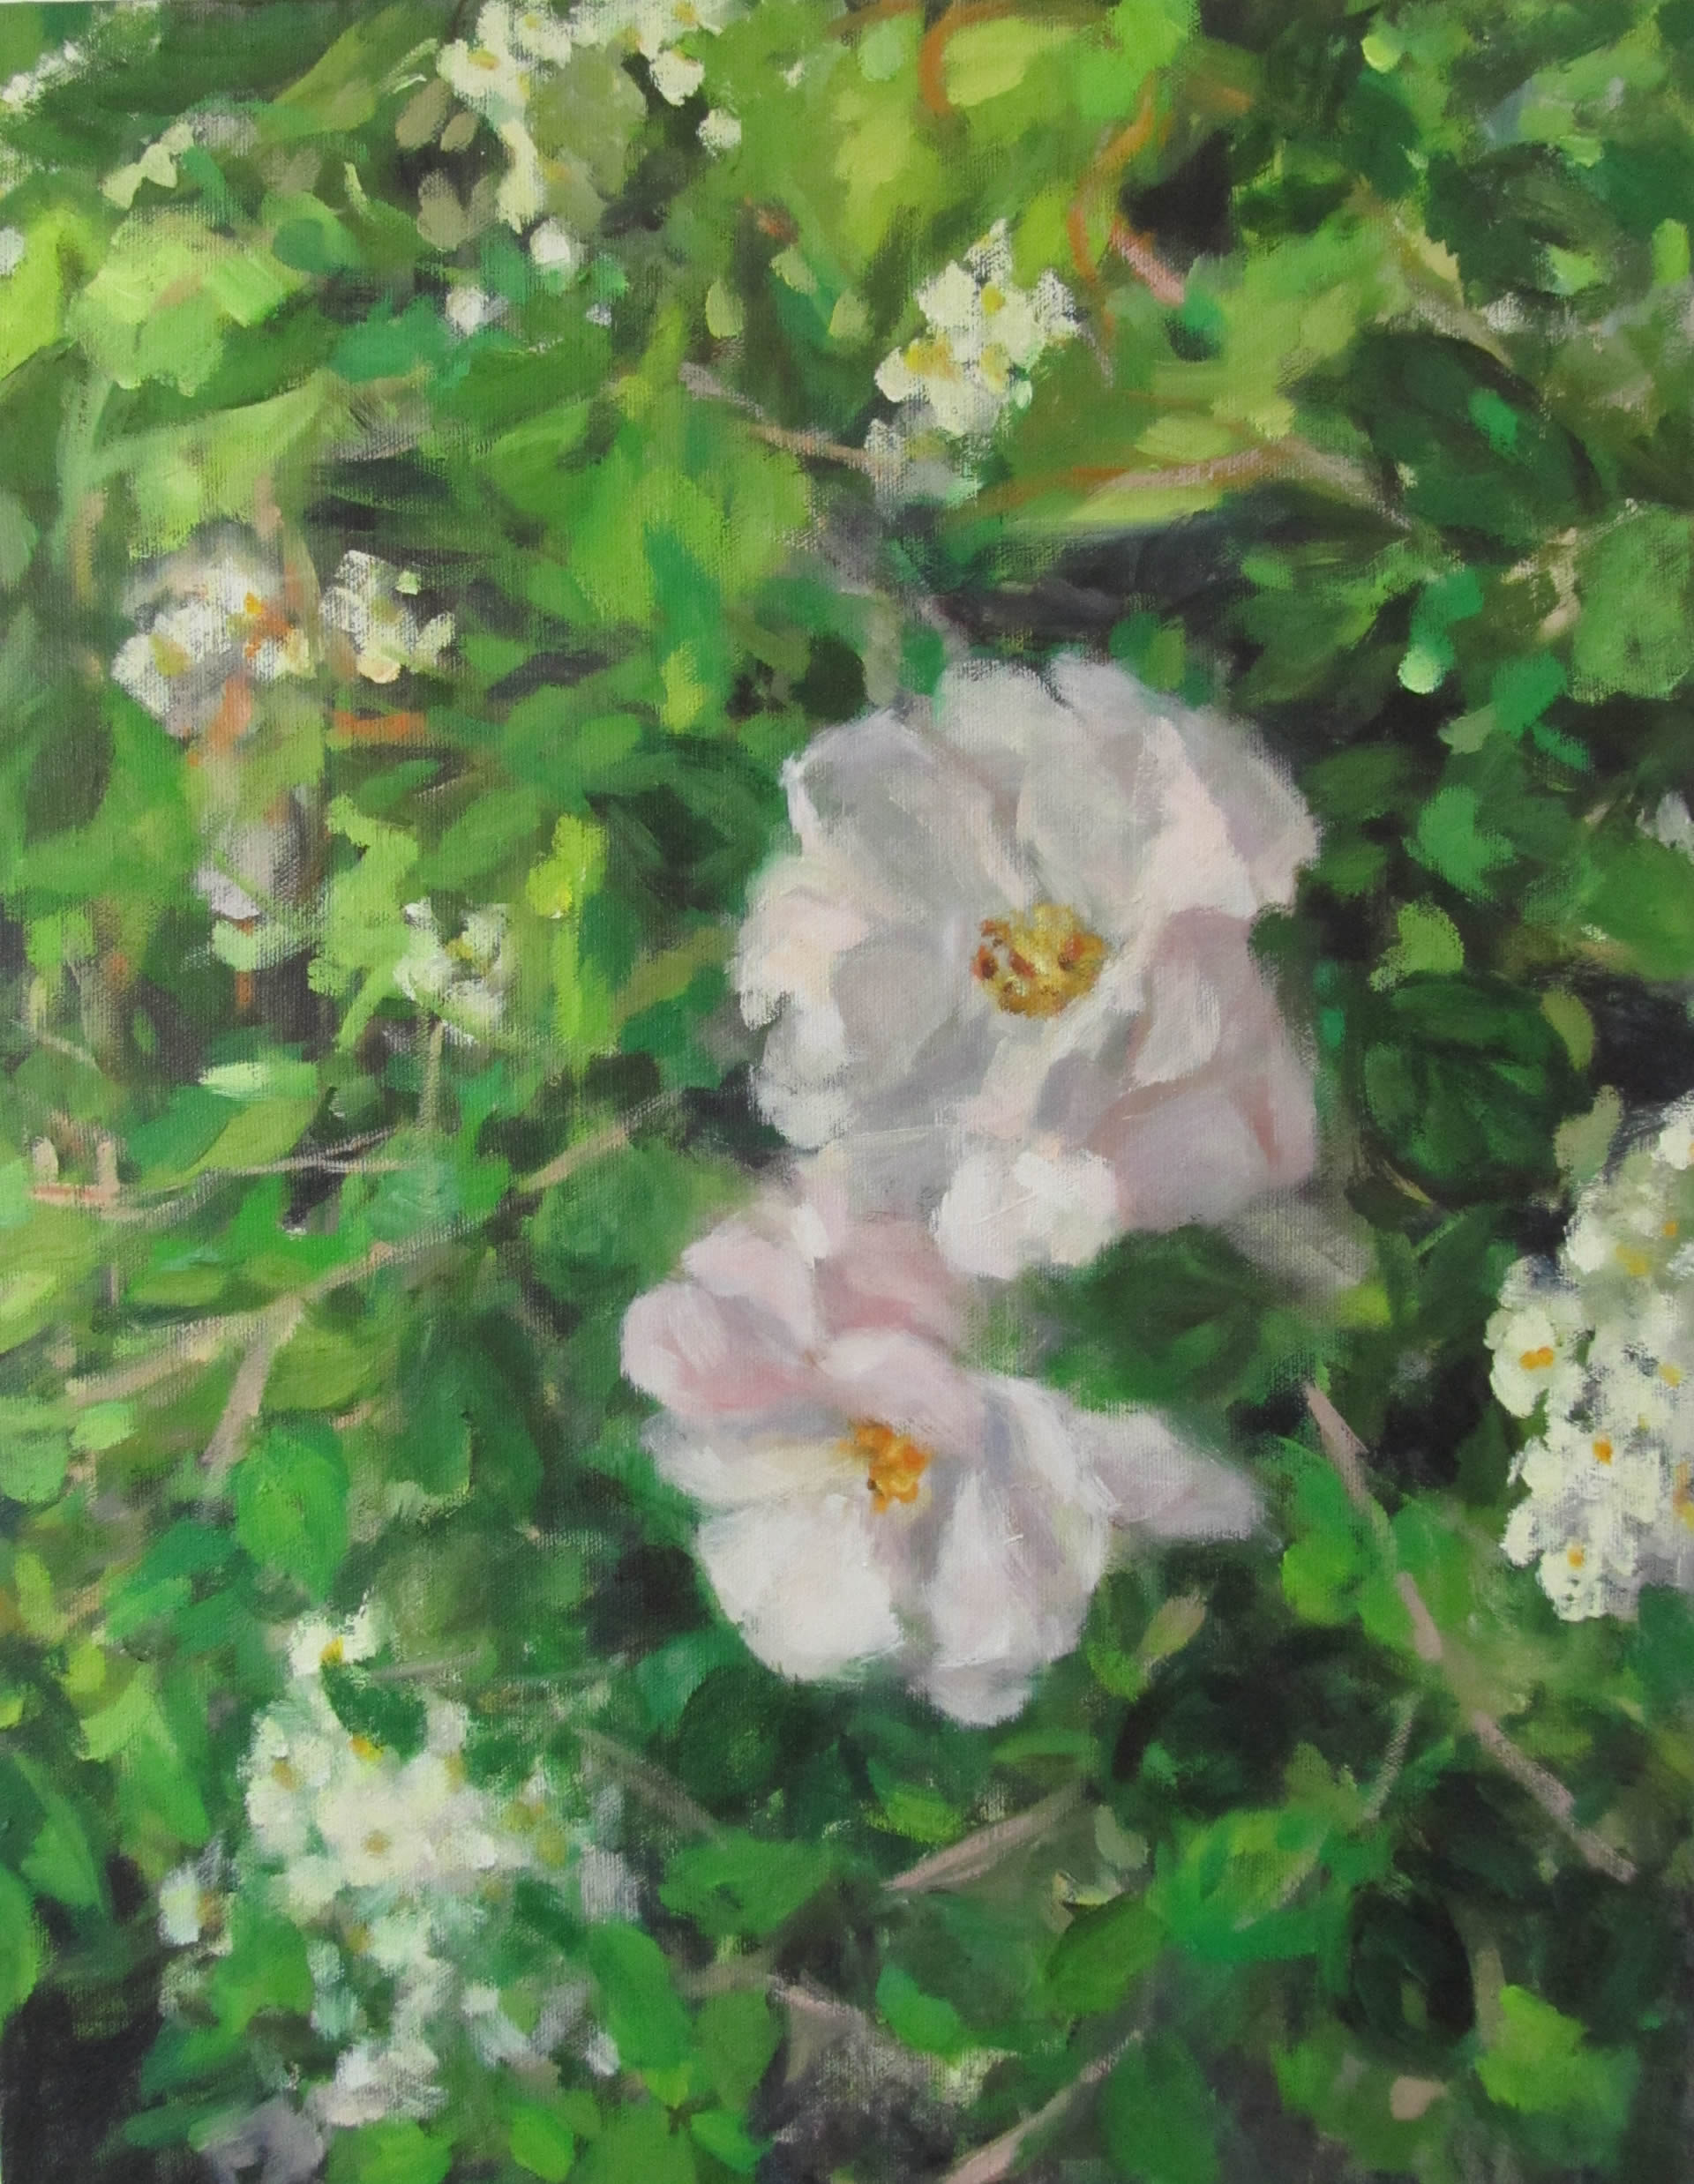 Eri-Ishii-Rose-Bush-In-Rain-18x14-Online-Art-Galleries